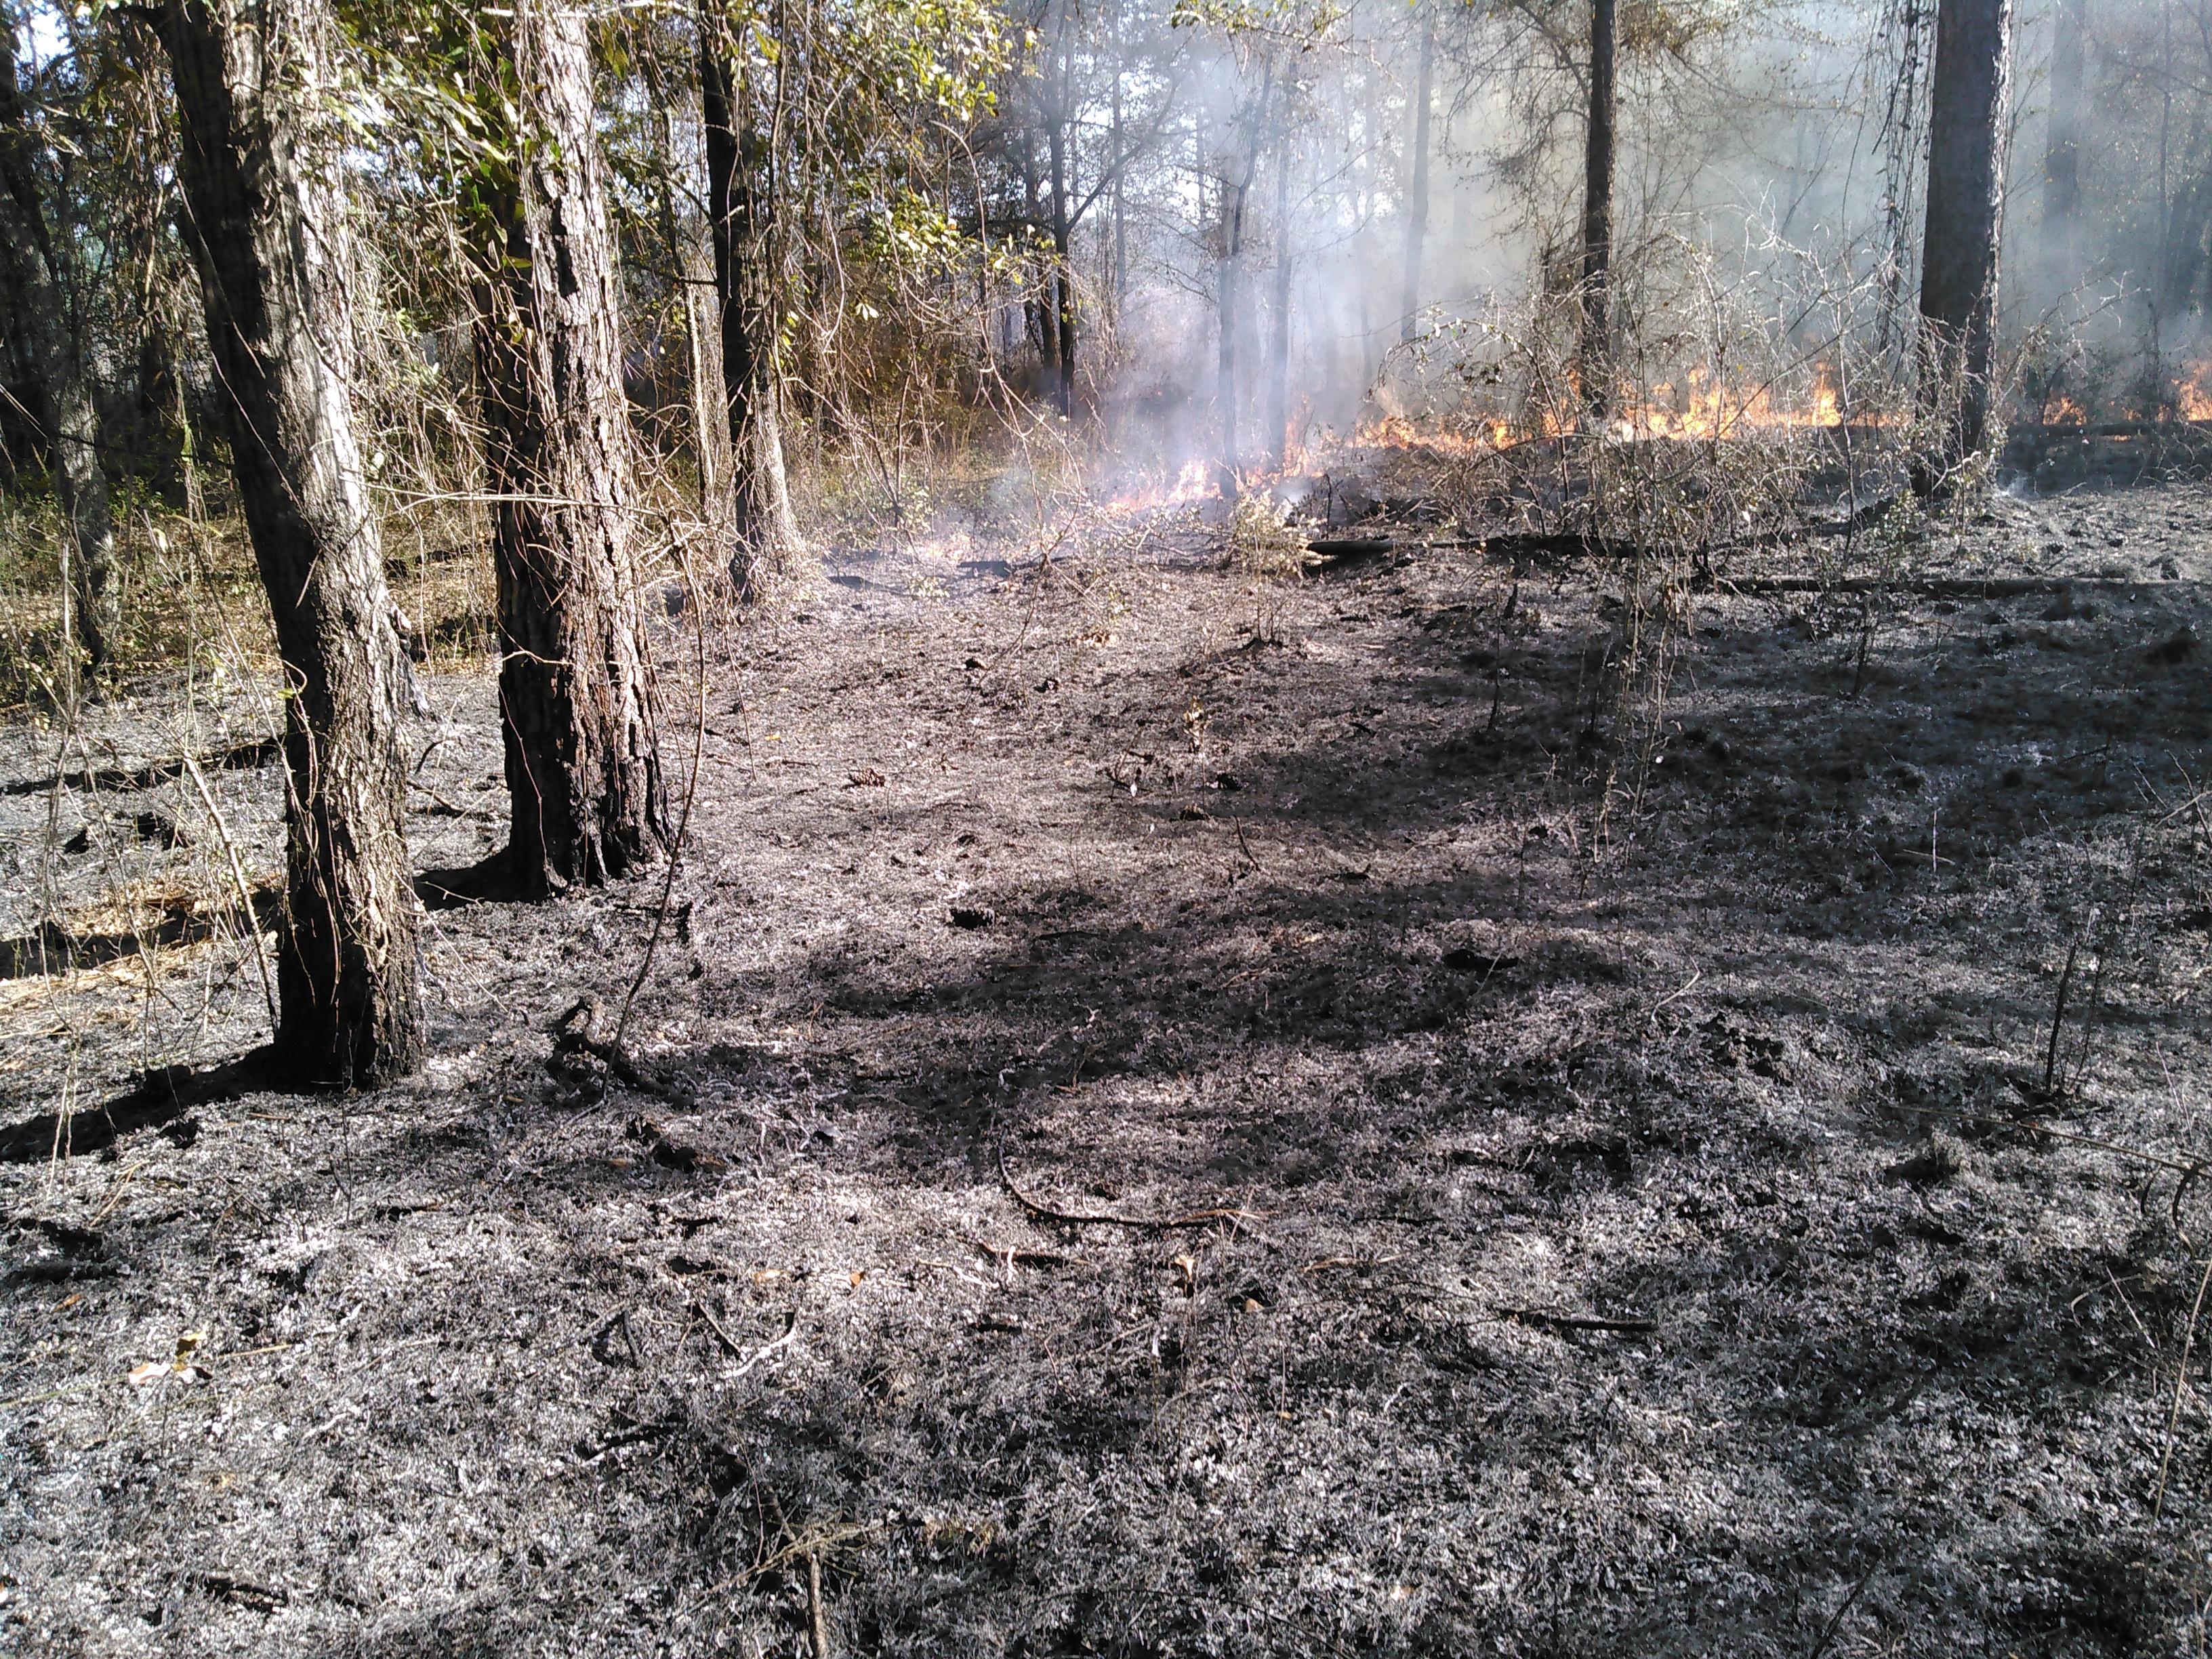 3264x2448 Wiregrass will come back soon, in Prescribed burn, by John S. Quarterman, for OkraParadiseFarms.com, 5 December 2015